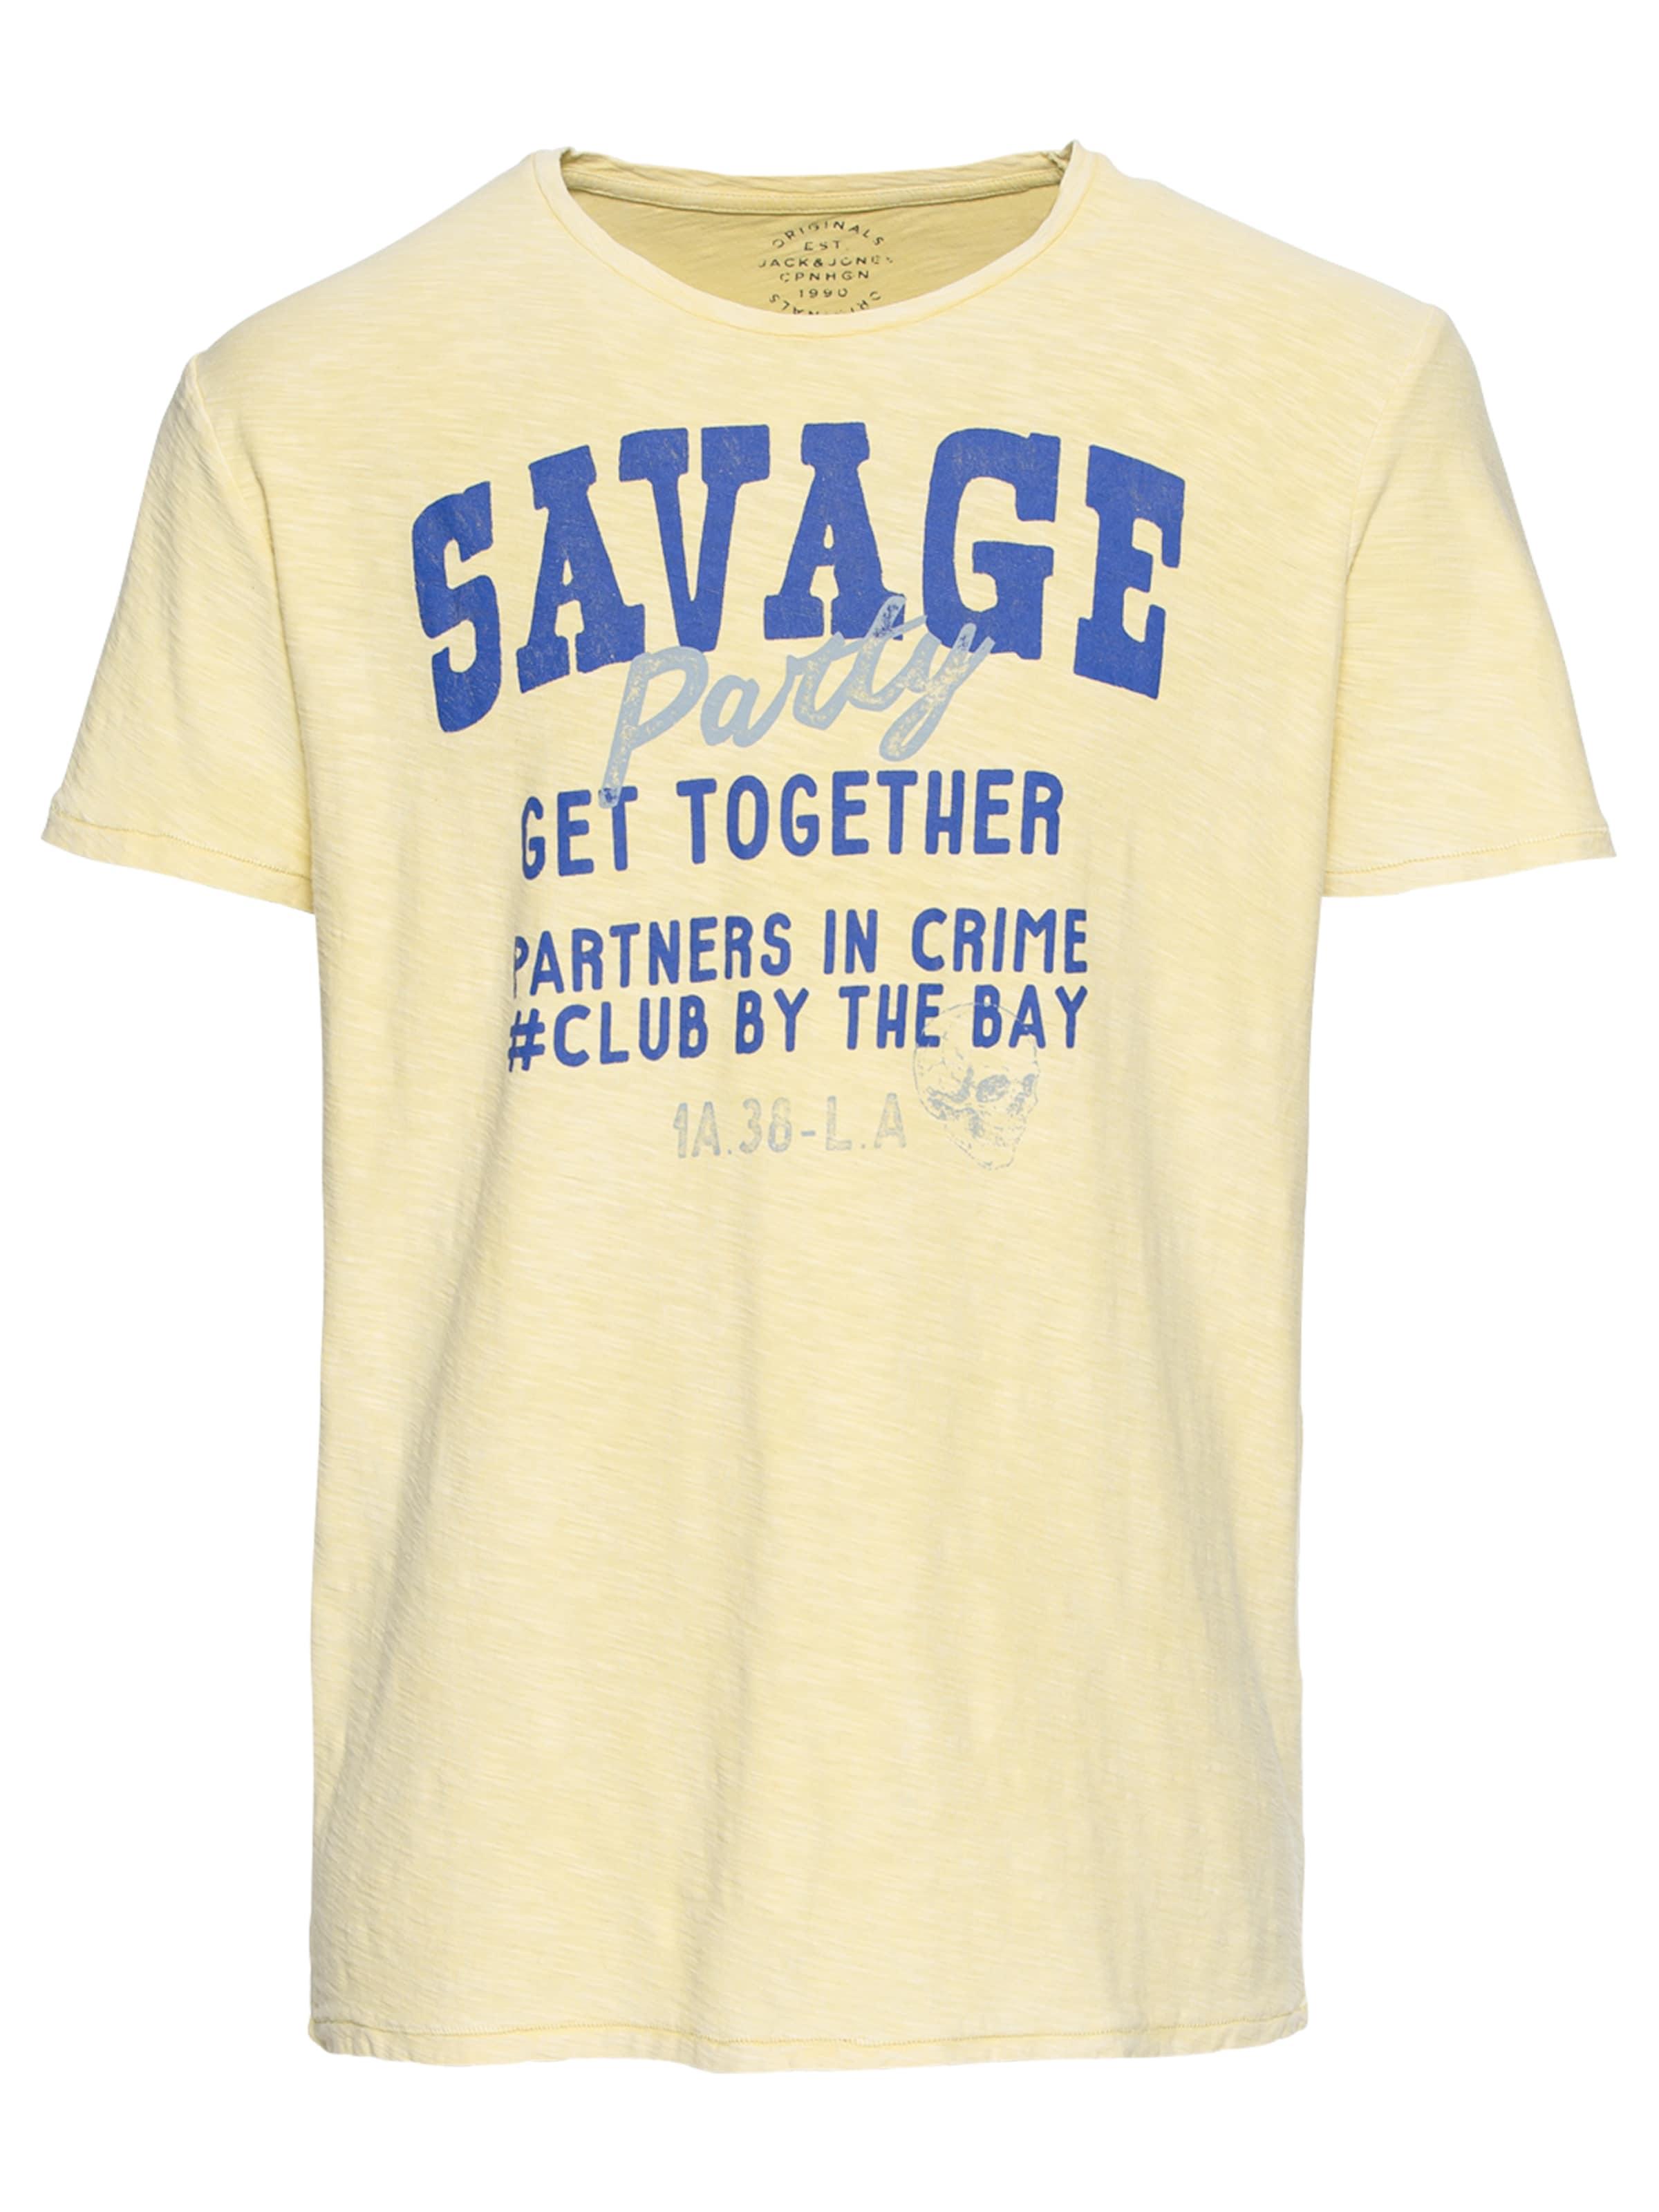 Jones 'jordaze Neck' En Crew BleuJaune shirt Jackamp; Clair Ss Tee T 7gf6YbvIy